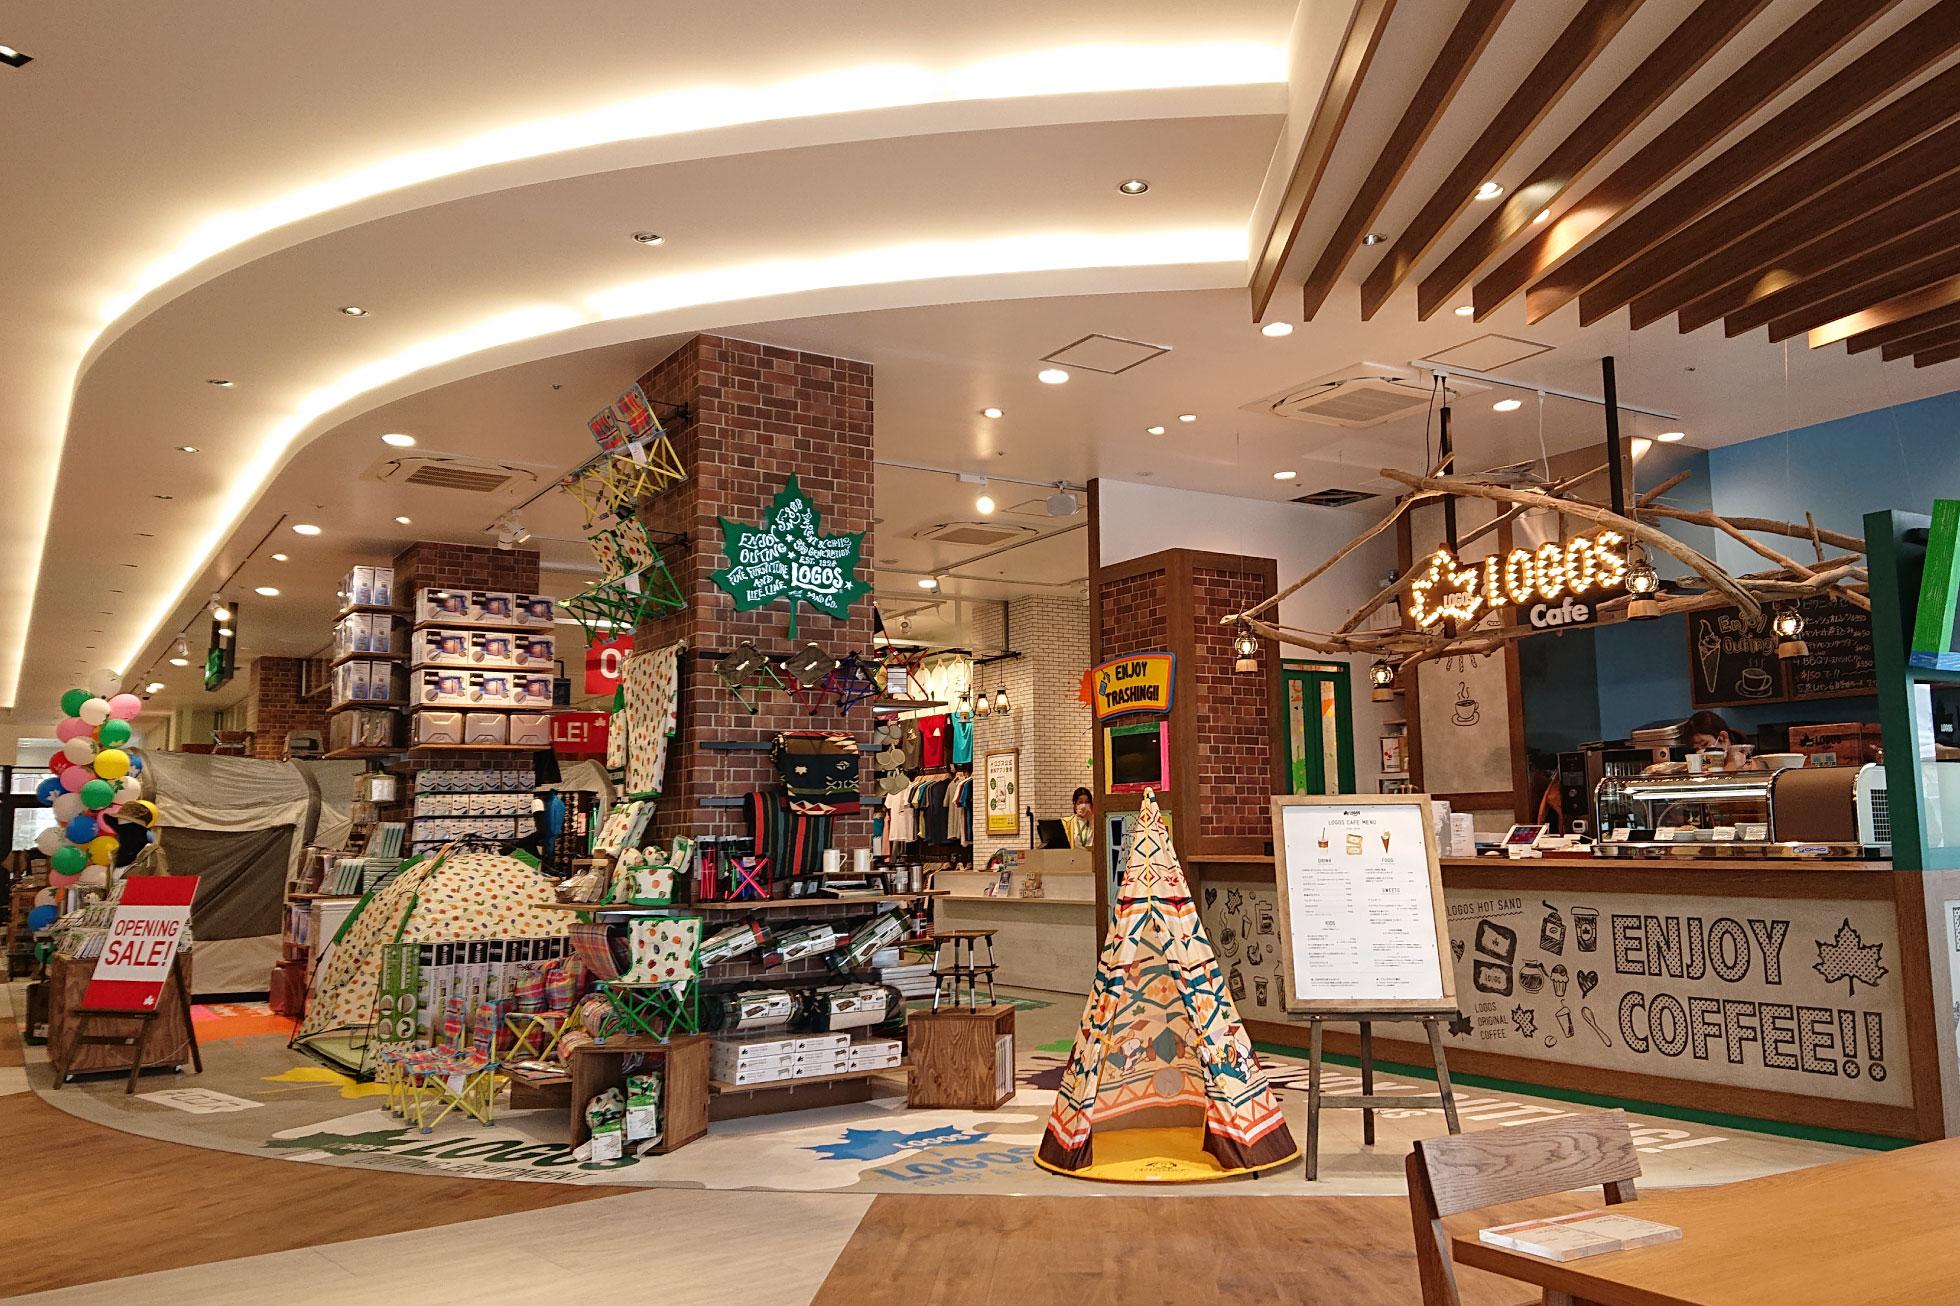 LOGOS SHOP & CAFE 三井アウトレットパーク 横浜ベイサイド店